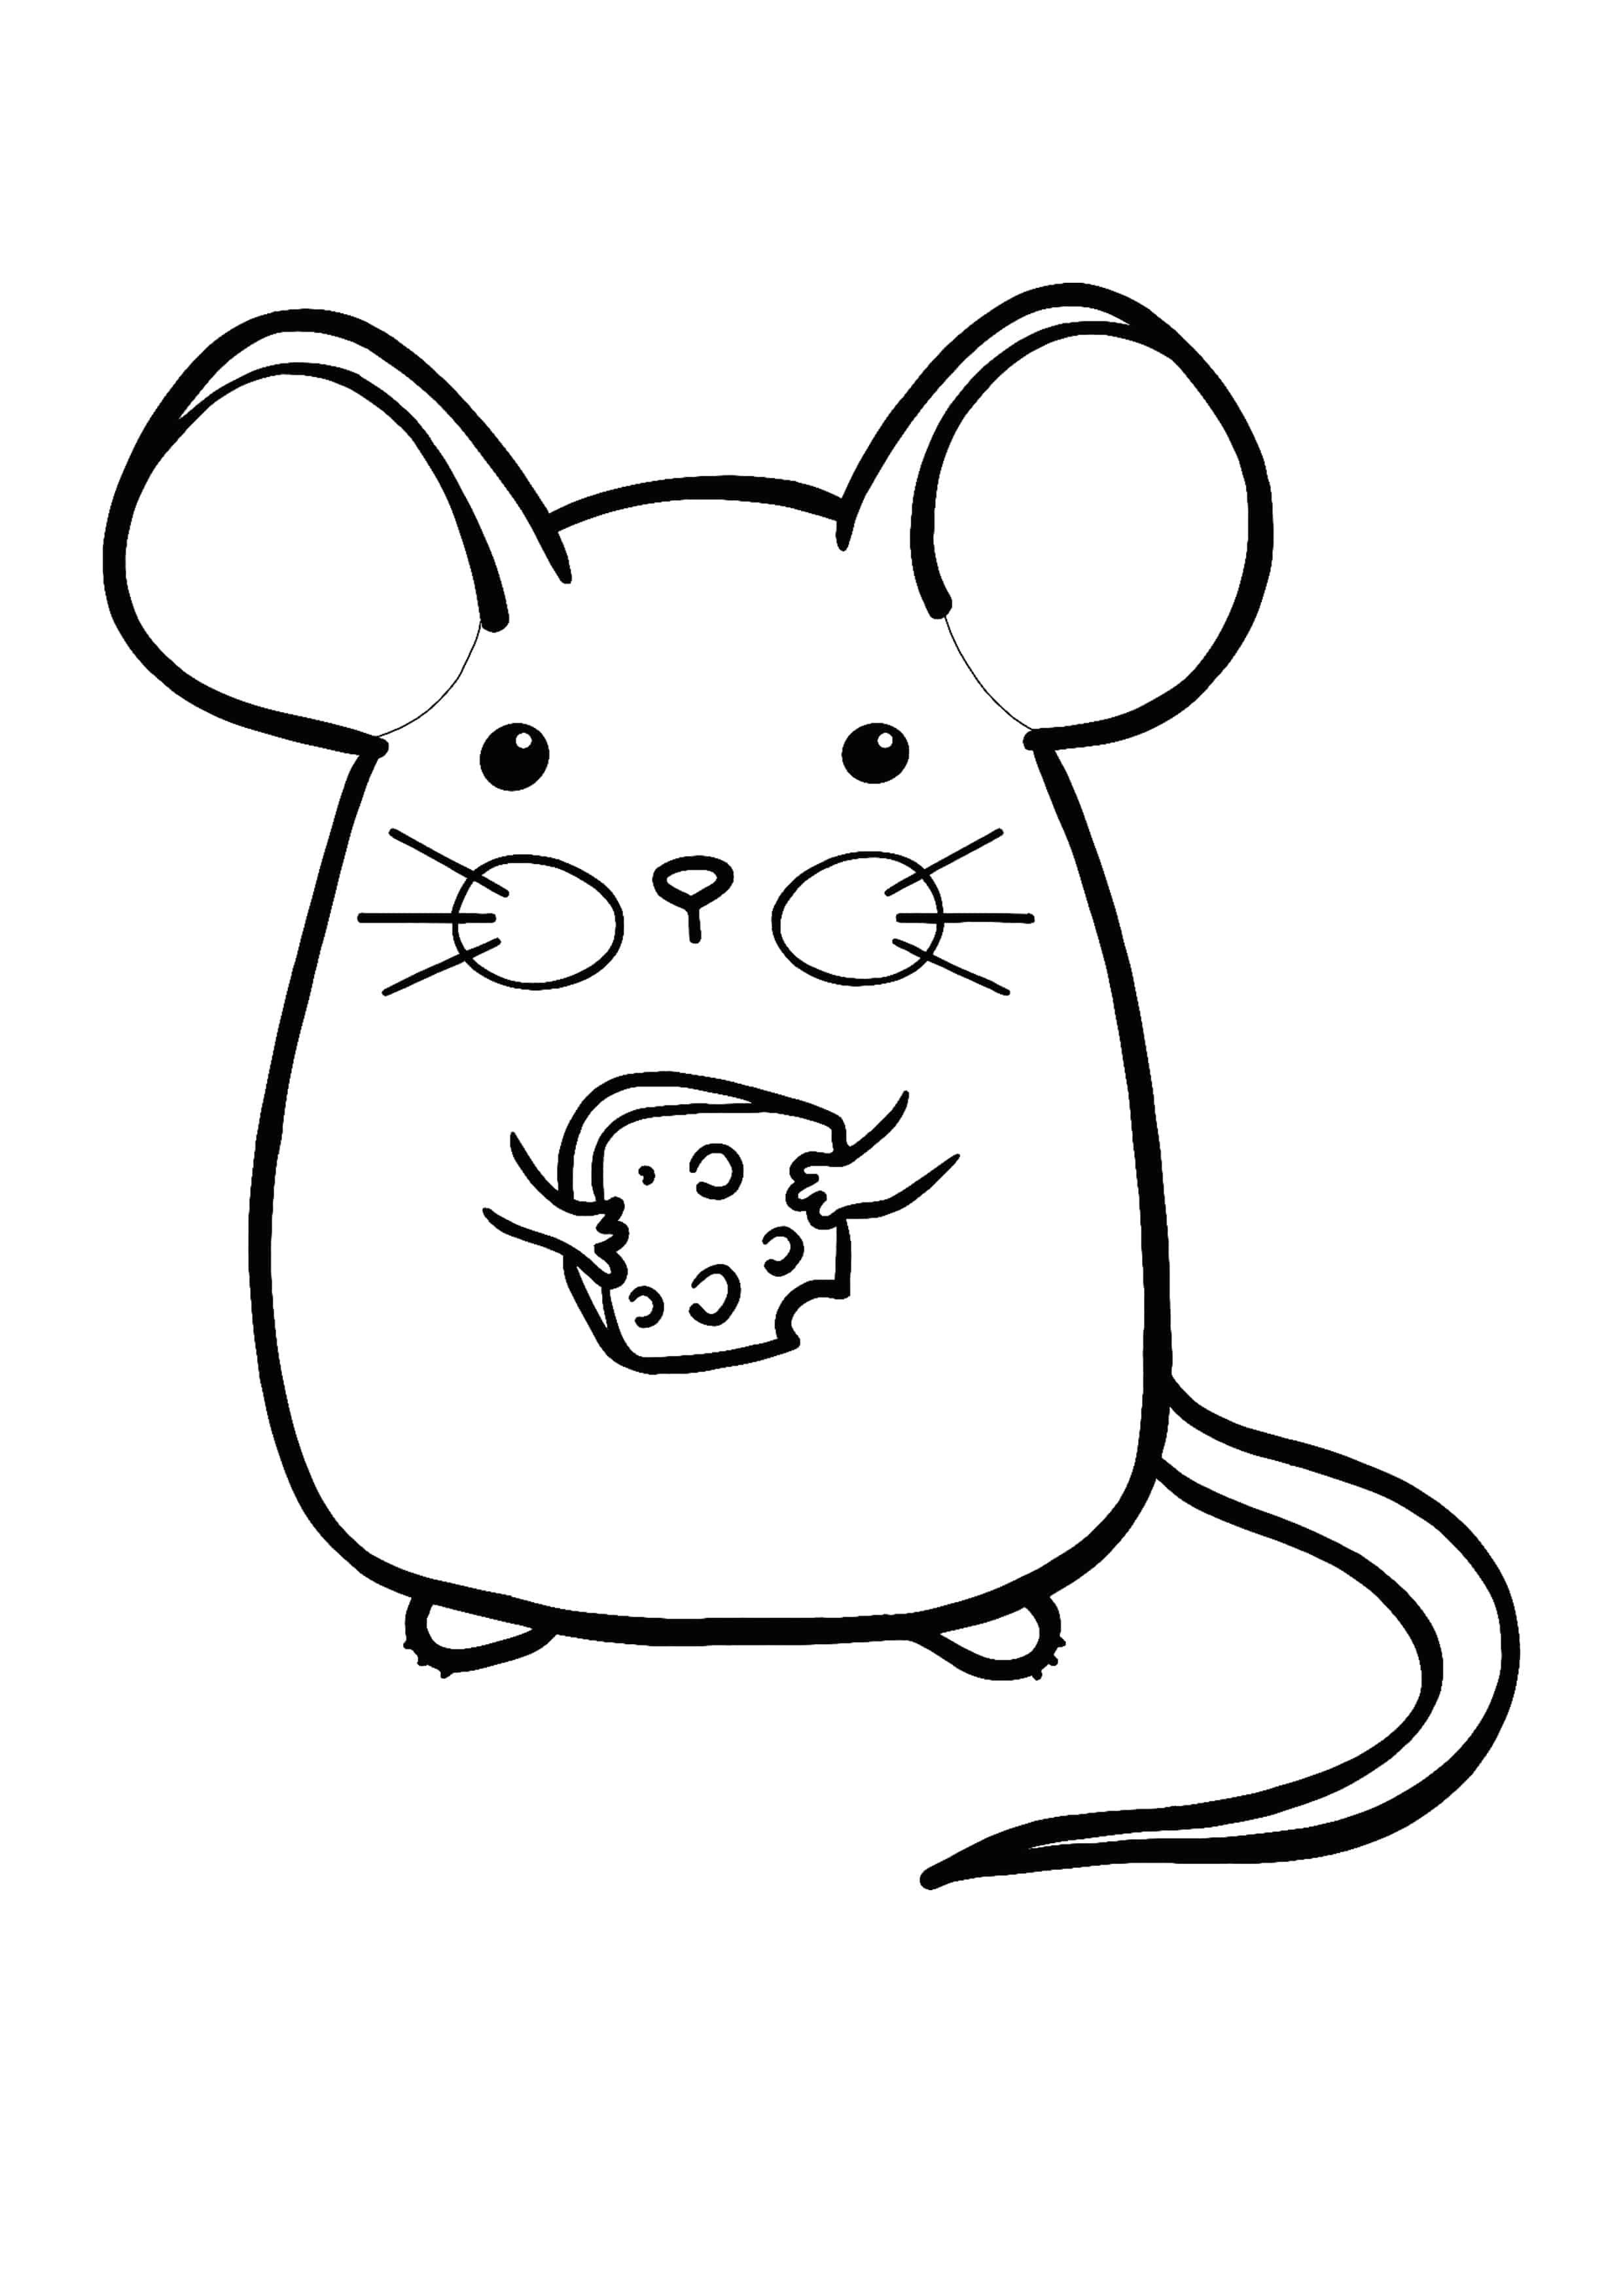 Kawaii Mouse Coloring Page Manga Coloring Book Cat Coloring Page Coloring Pages